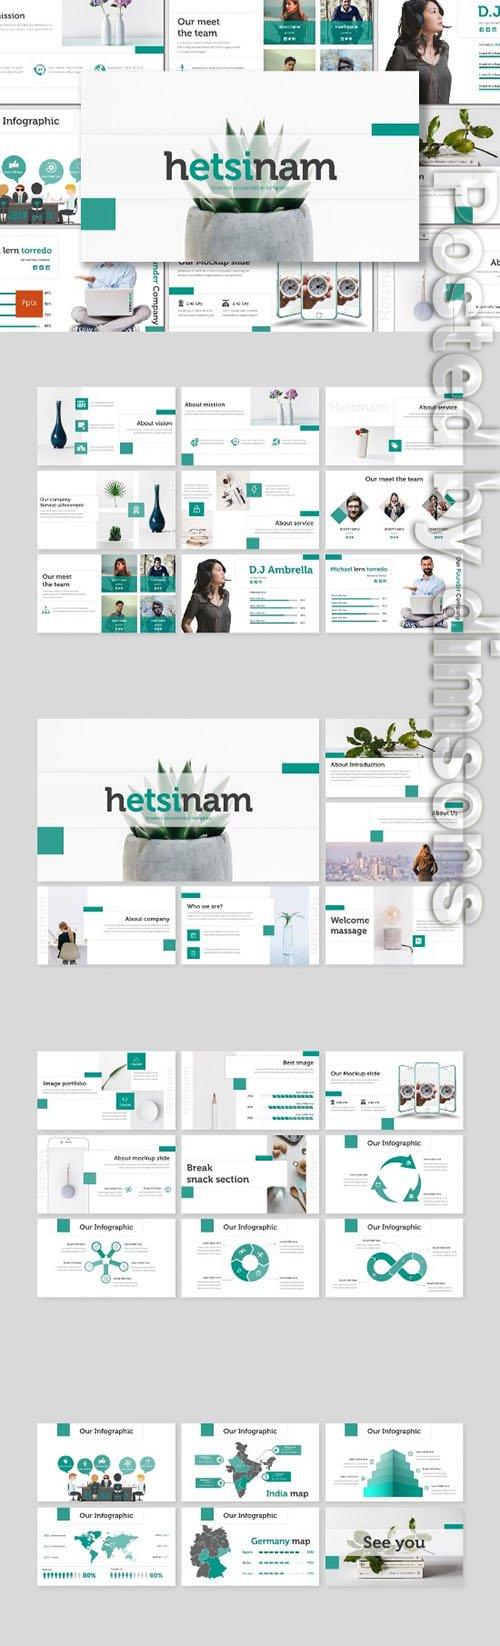 Hetsinam - PowerPoint, Keynote and Google Slides Templates